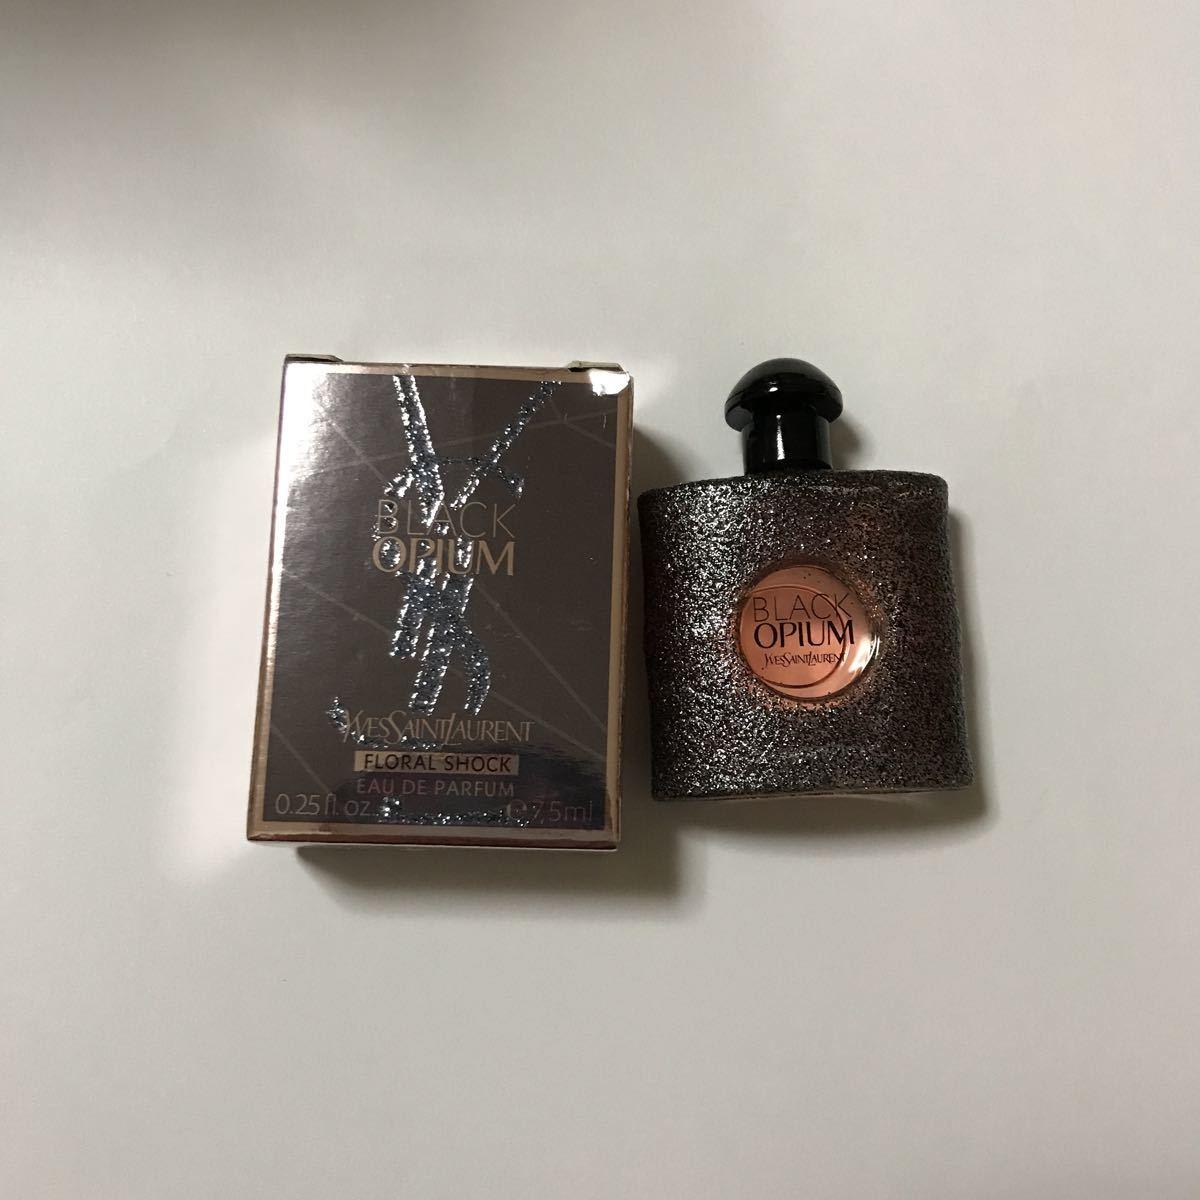 Sun Rolan Black Opium Floral Shock Miniature Perfume Mini Bottle